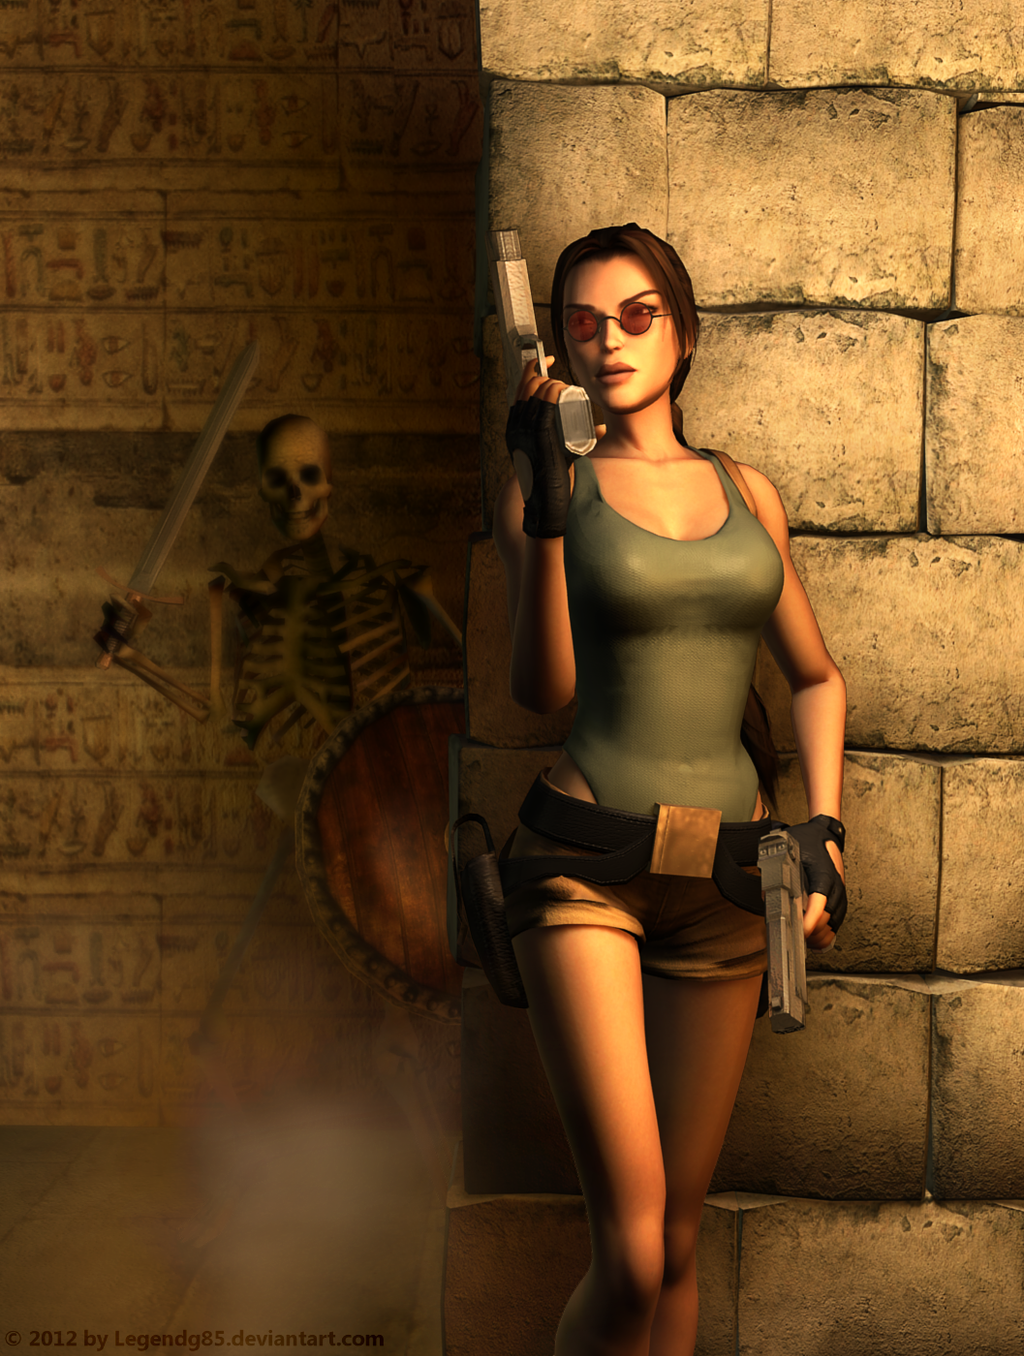 Lara Croft 120 by legendg85